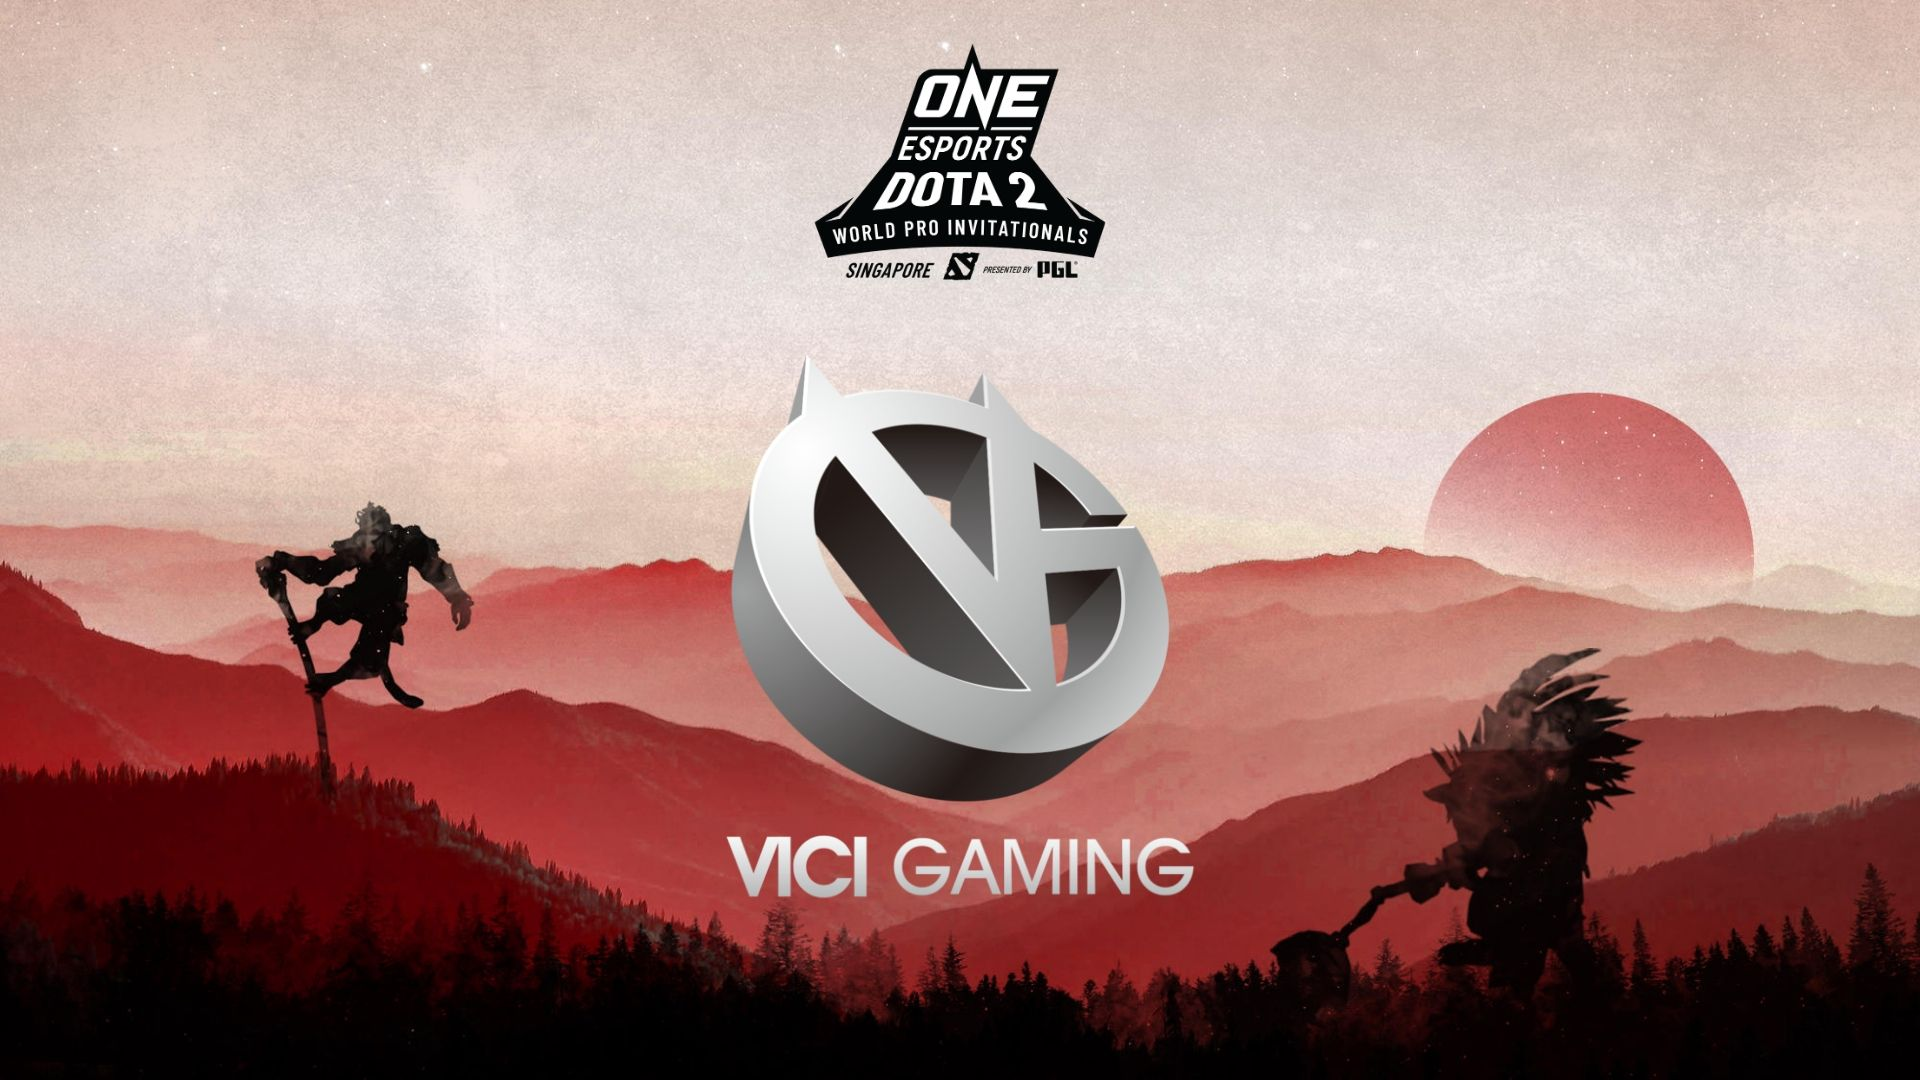 vg vs tnc one esports world pro invitational